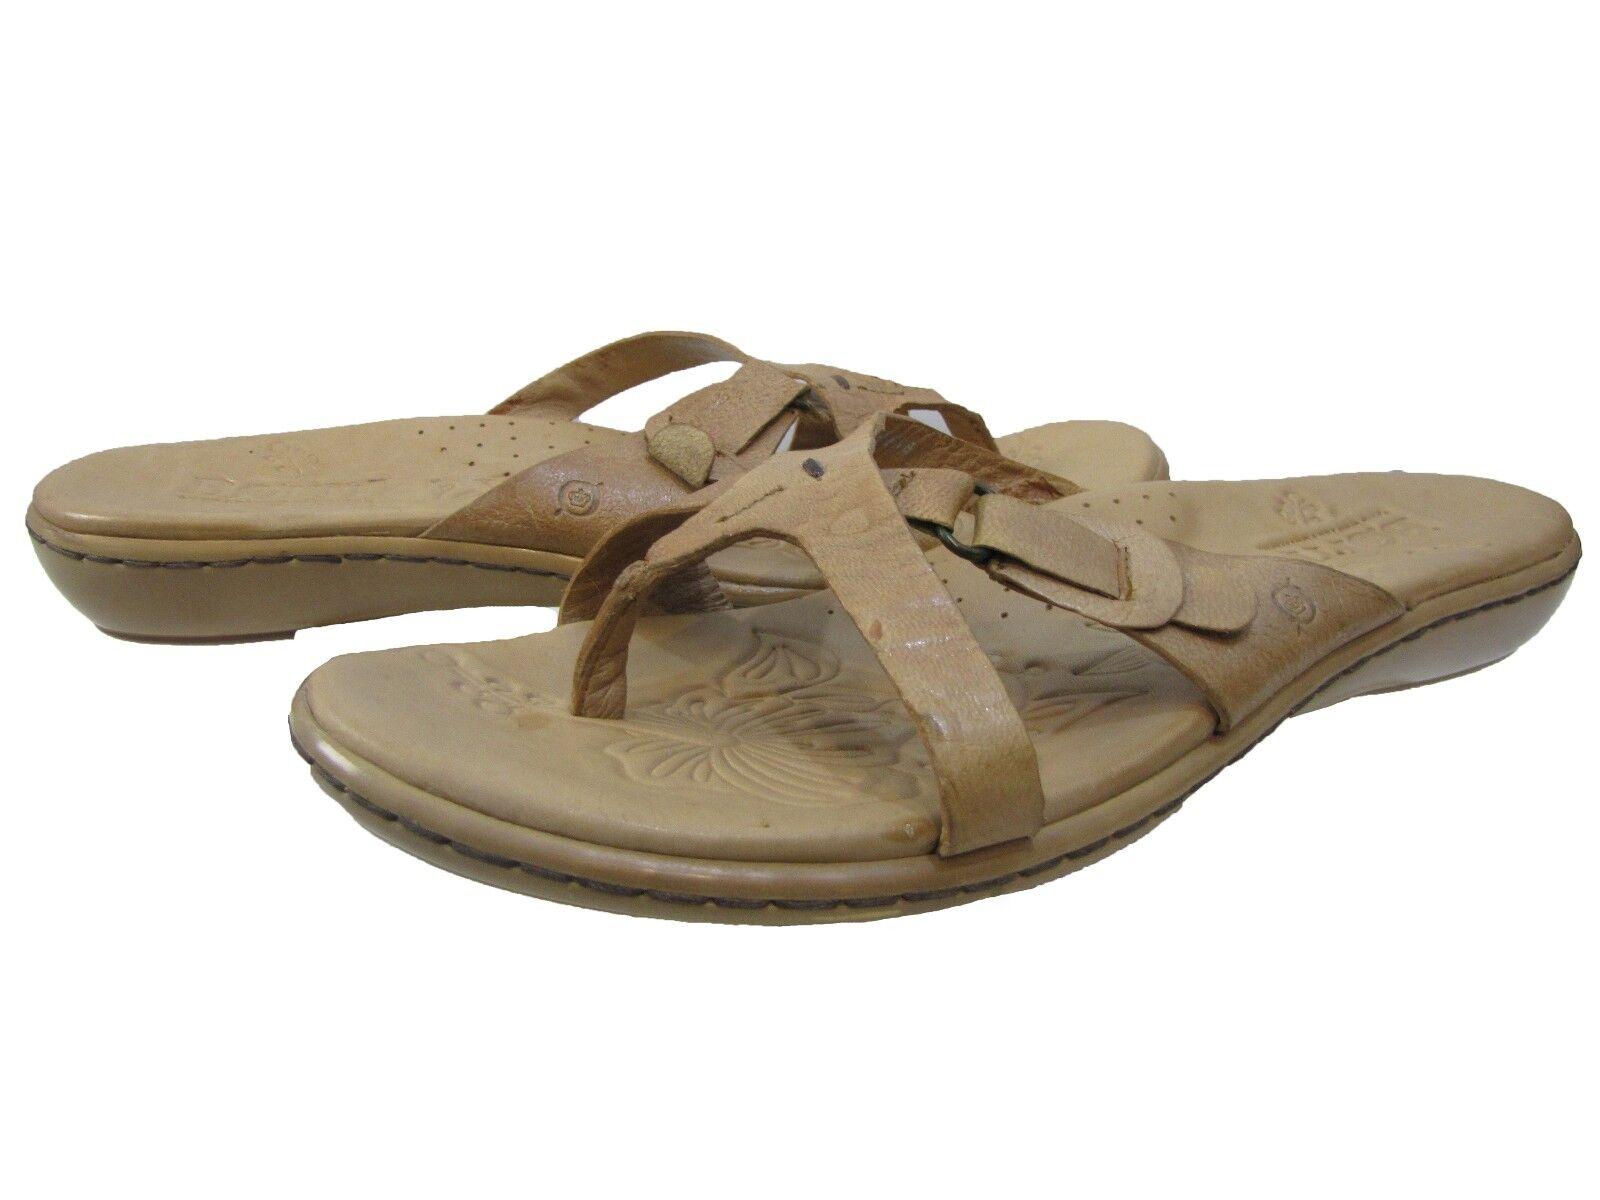 Born Toe Womens 2306 Slip-On Open Toe Born Casual Wedge Thong Fashion Sandals Shoes 29714b